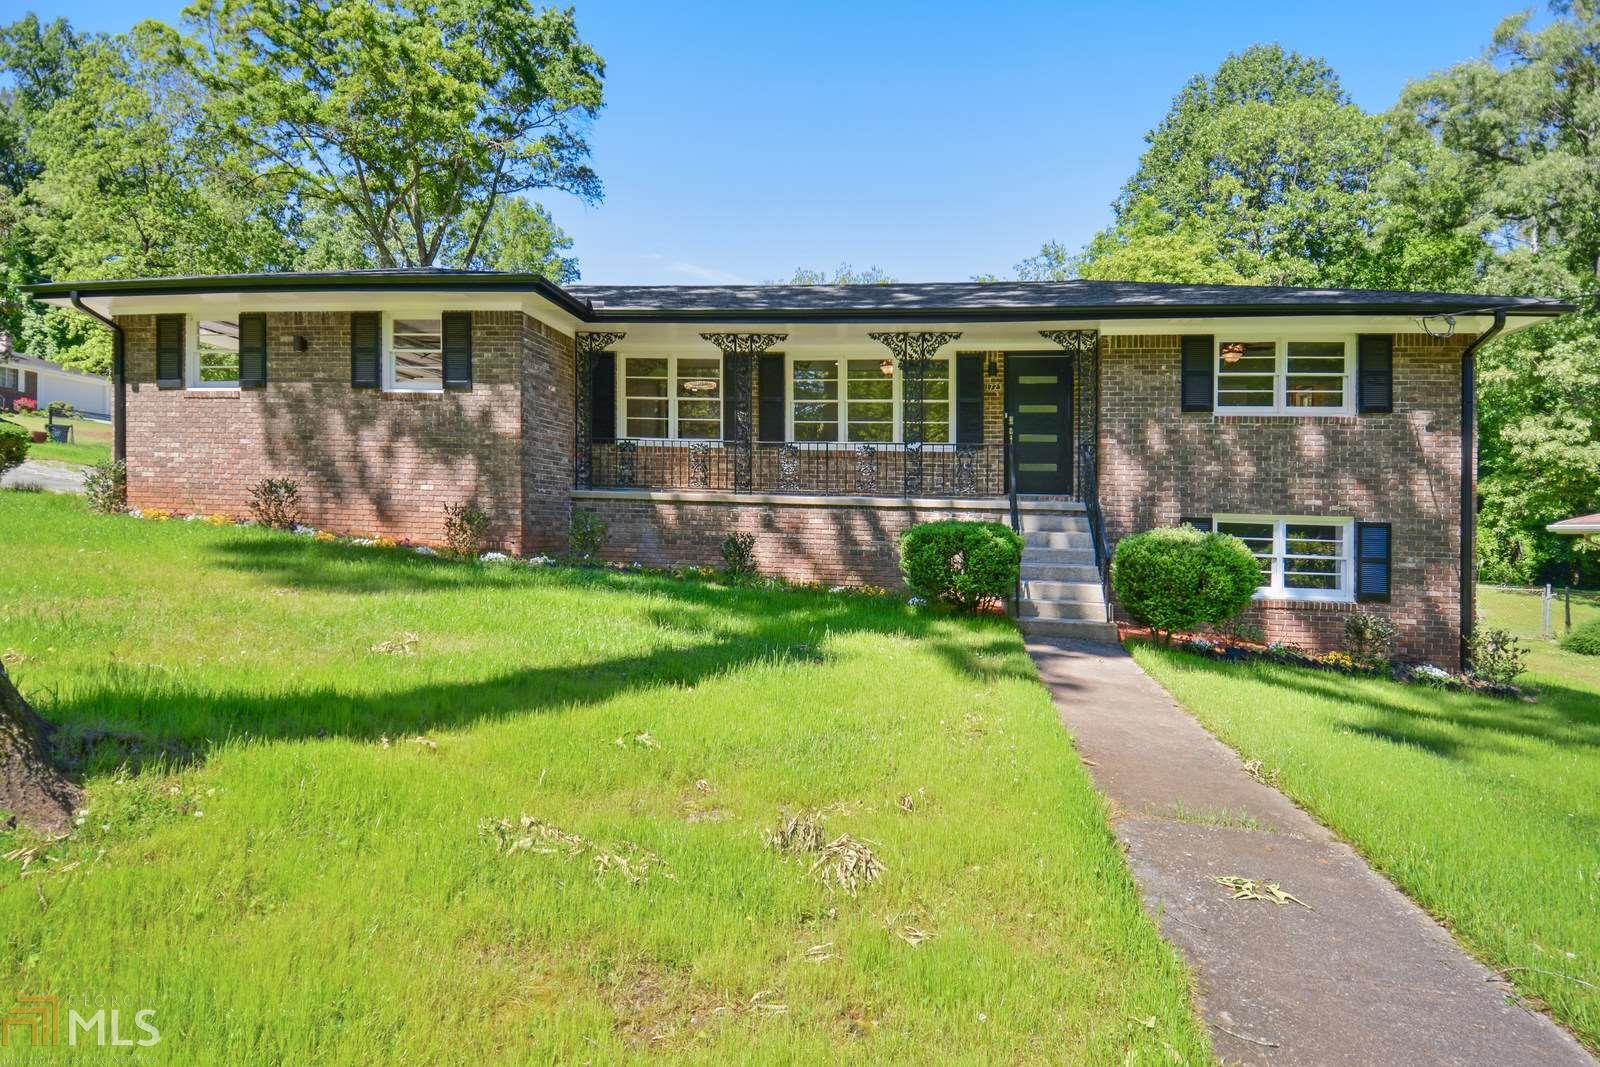 1723 Glenhaven Cir, Decatur, GA 30035 - MLS#: 8722949